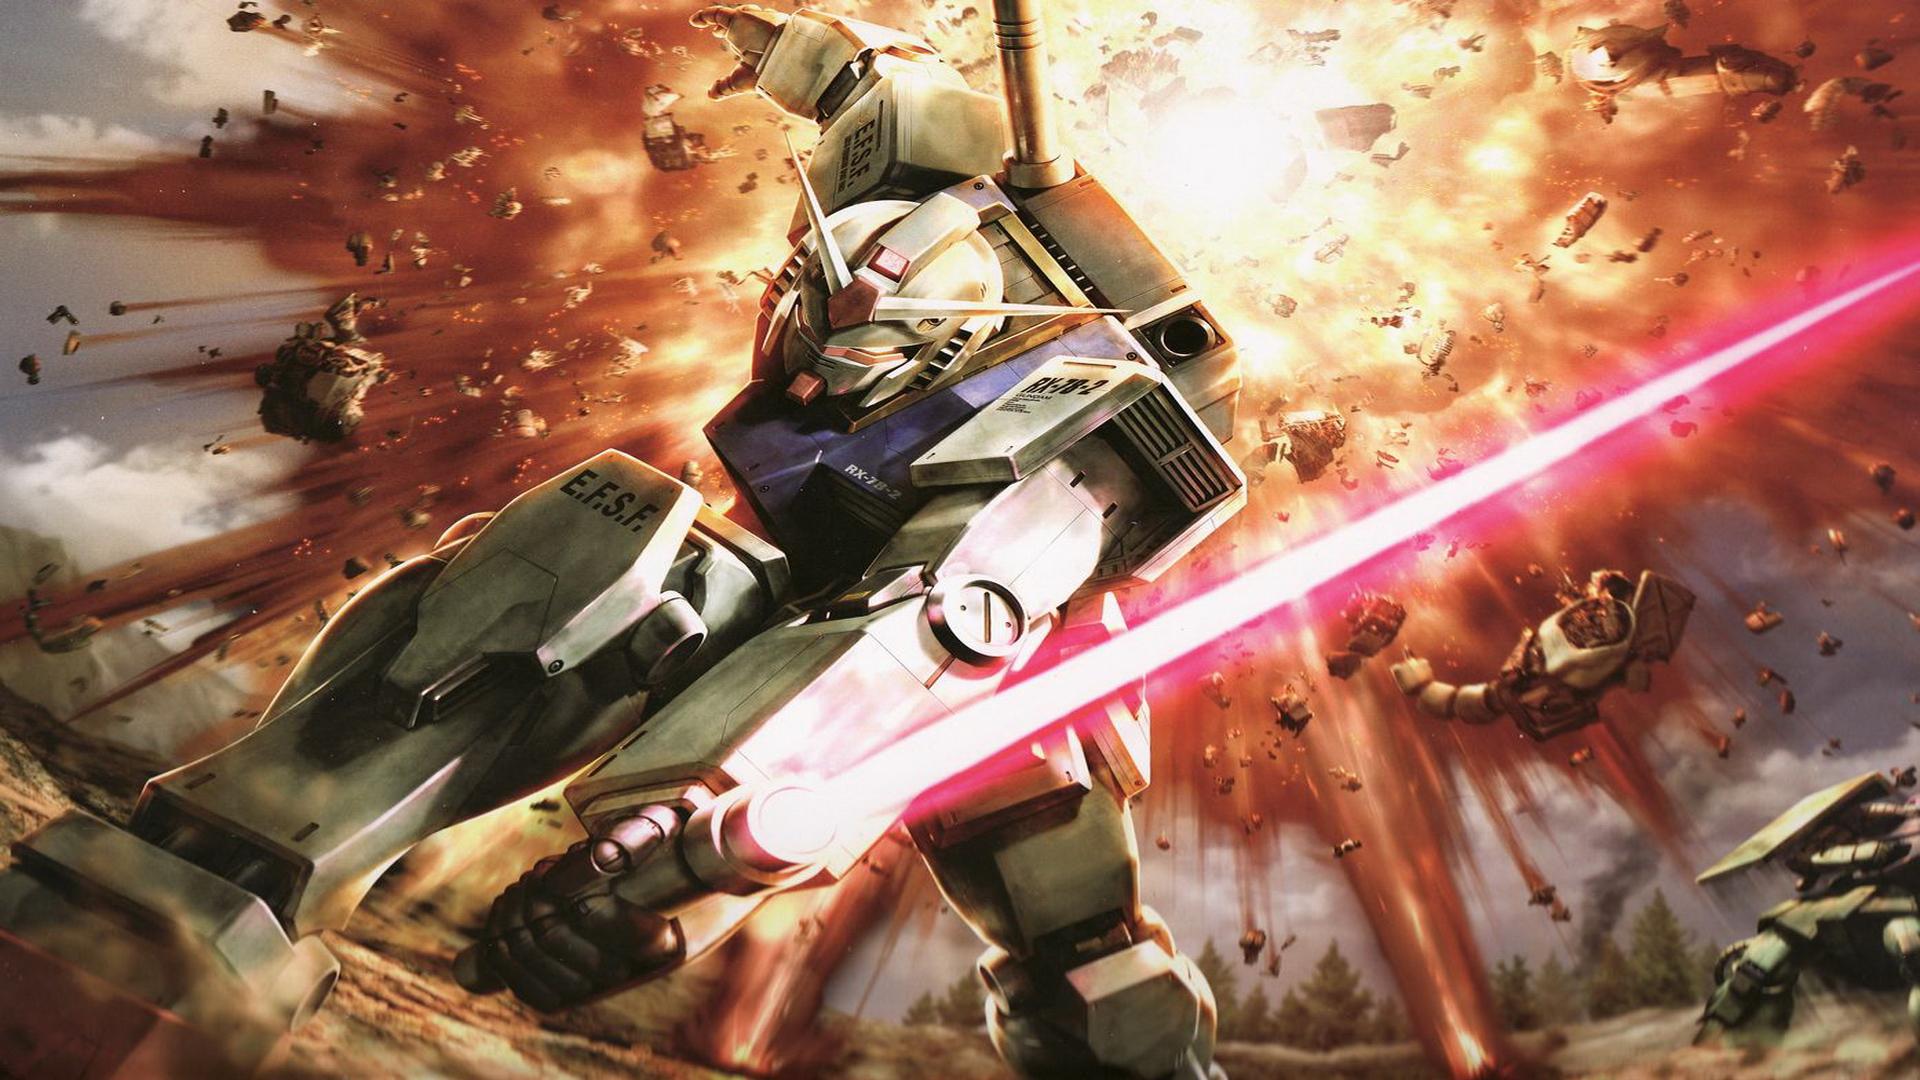 38 Gundam Wallpapers 1080p On Wallpapersafari